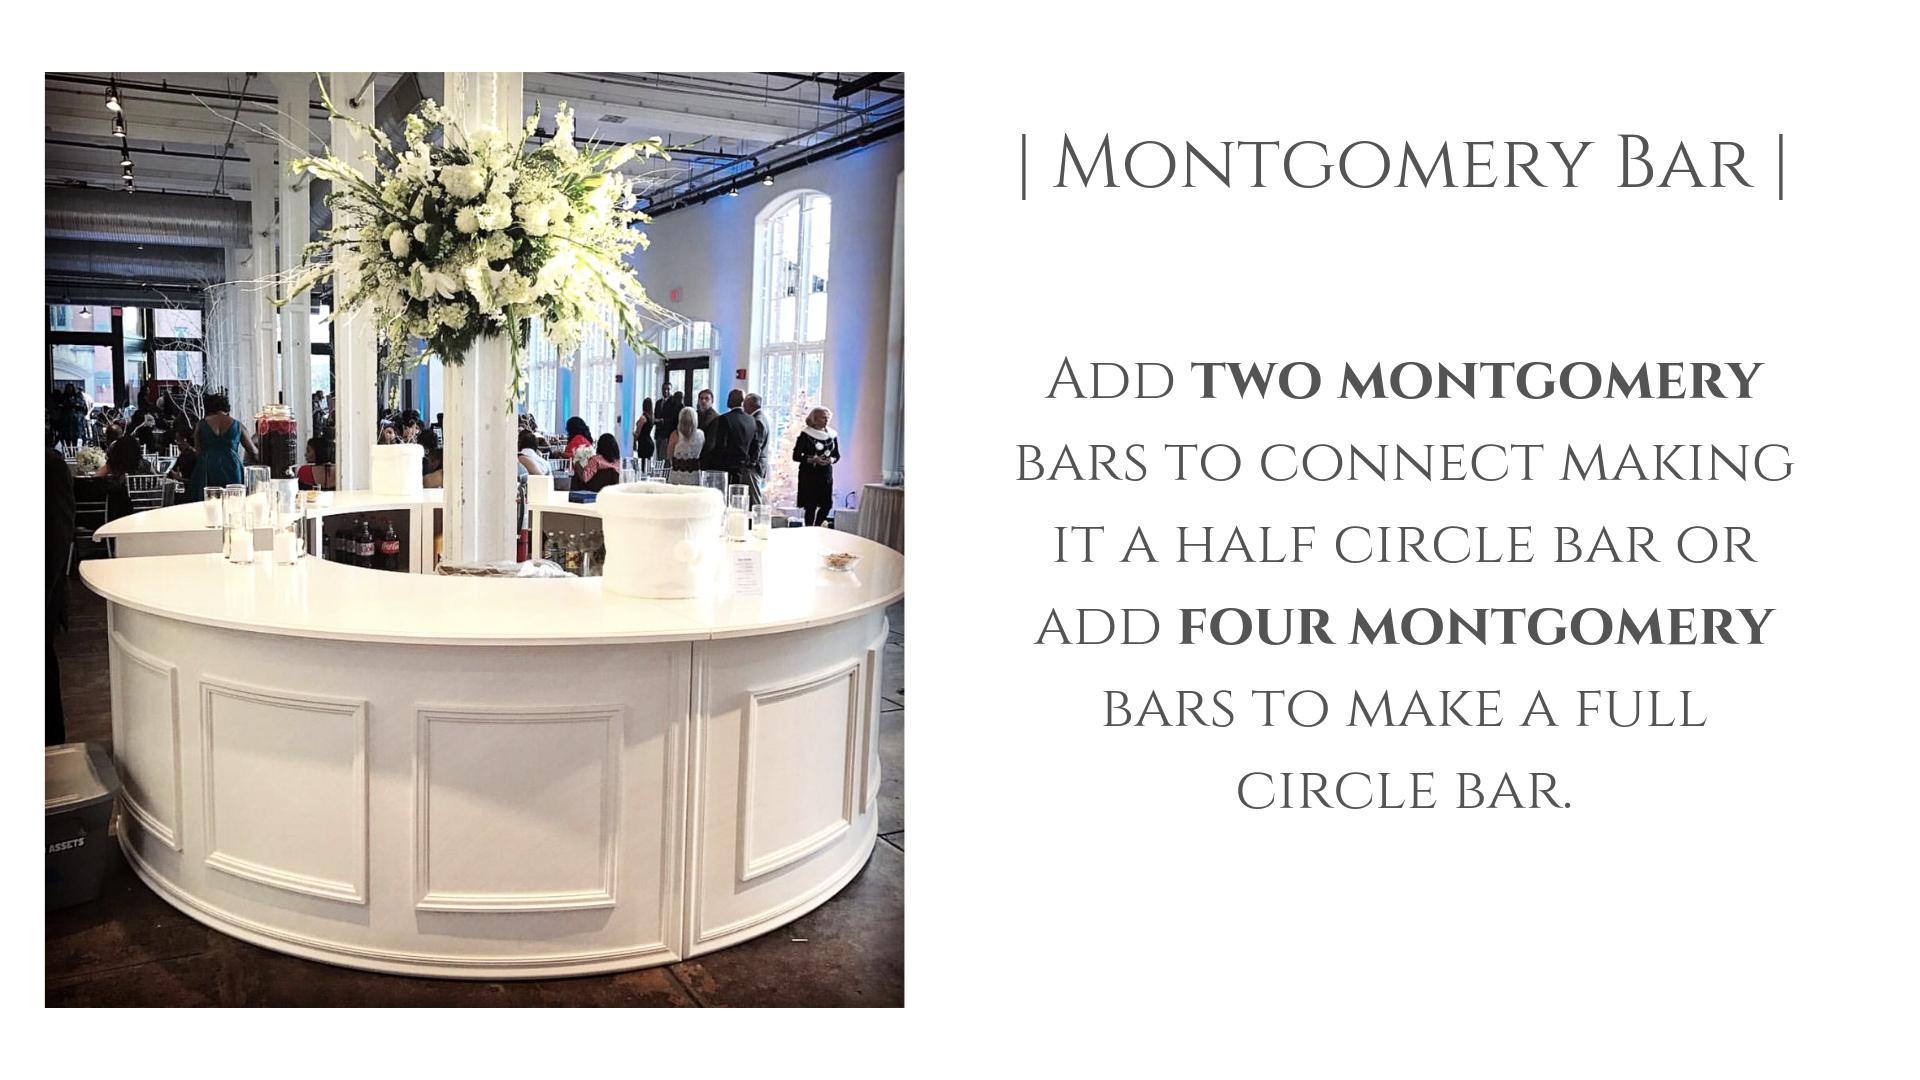 Montgomery Bar Full Circle